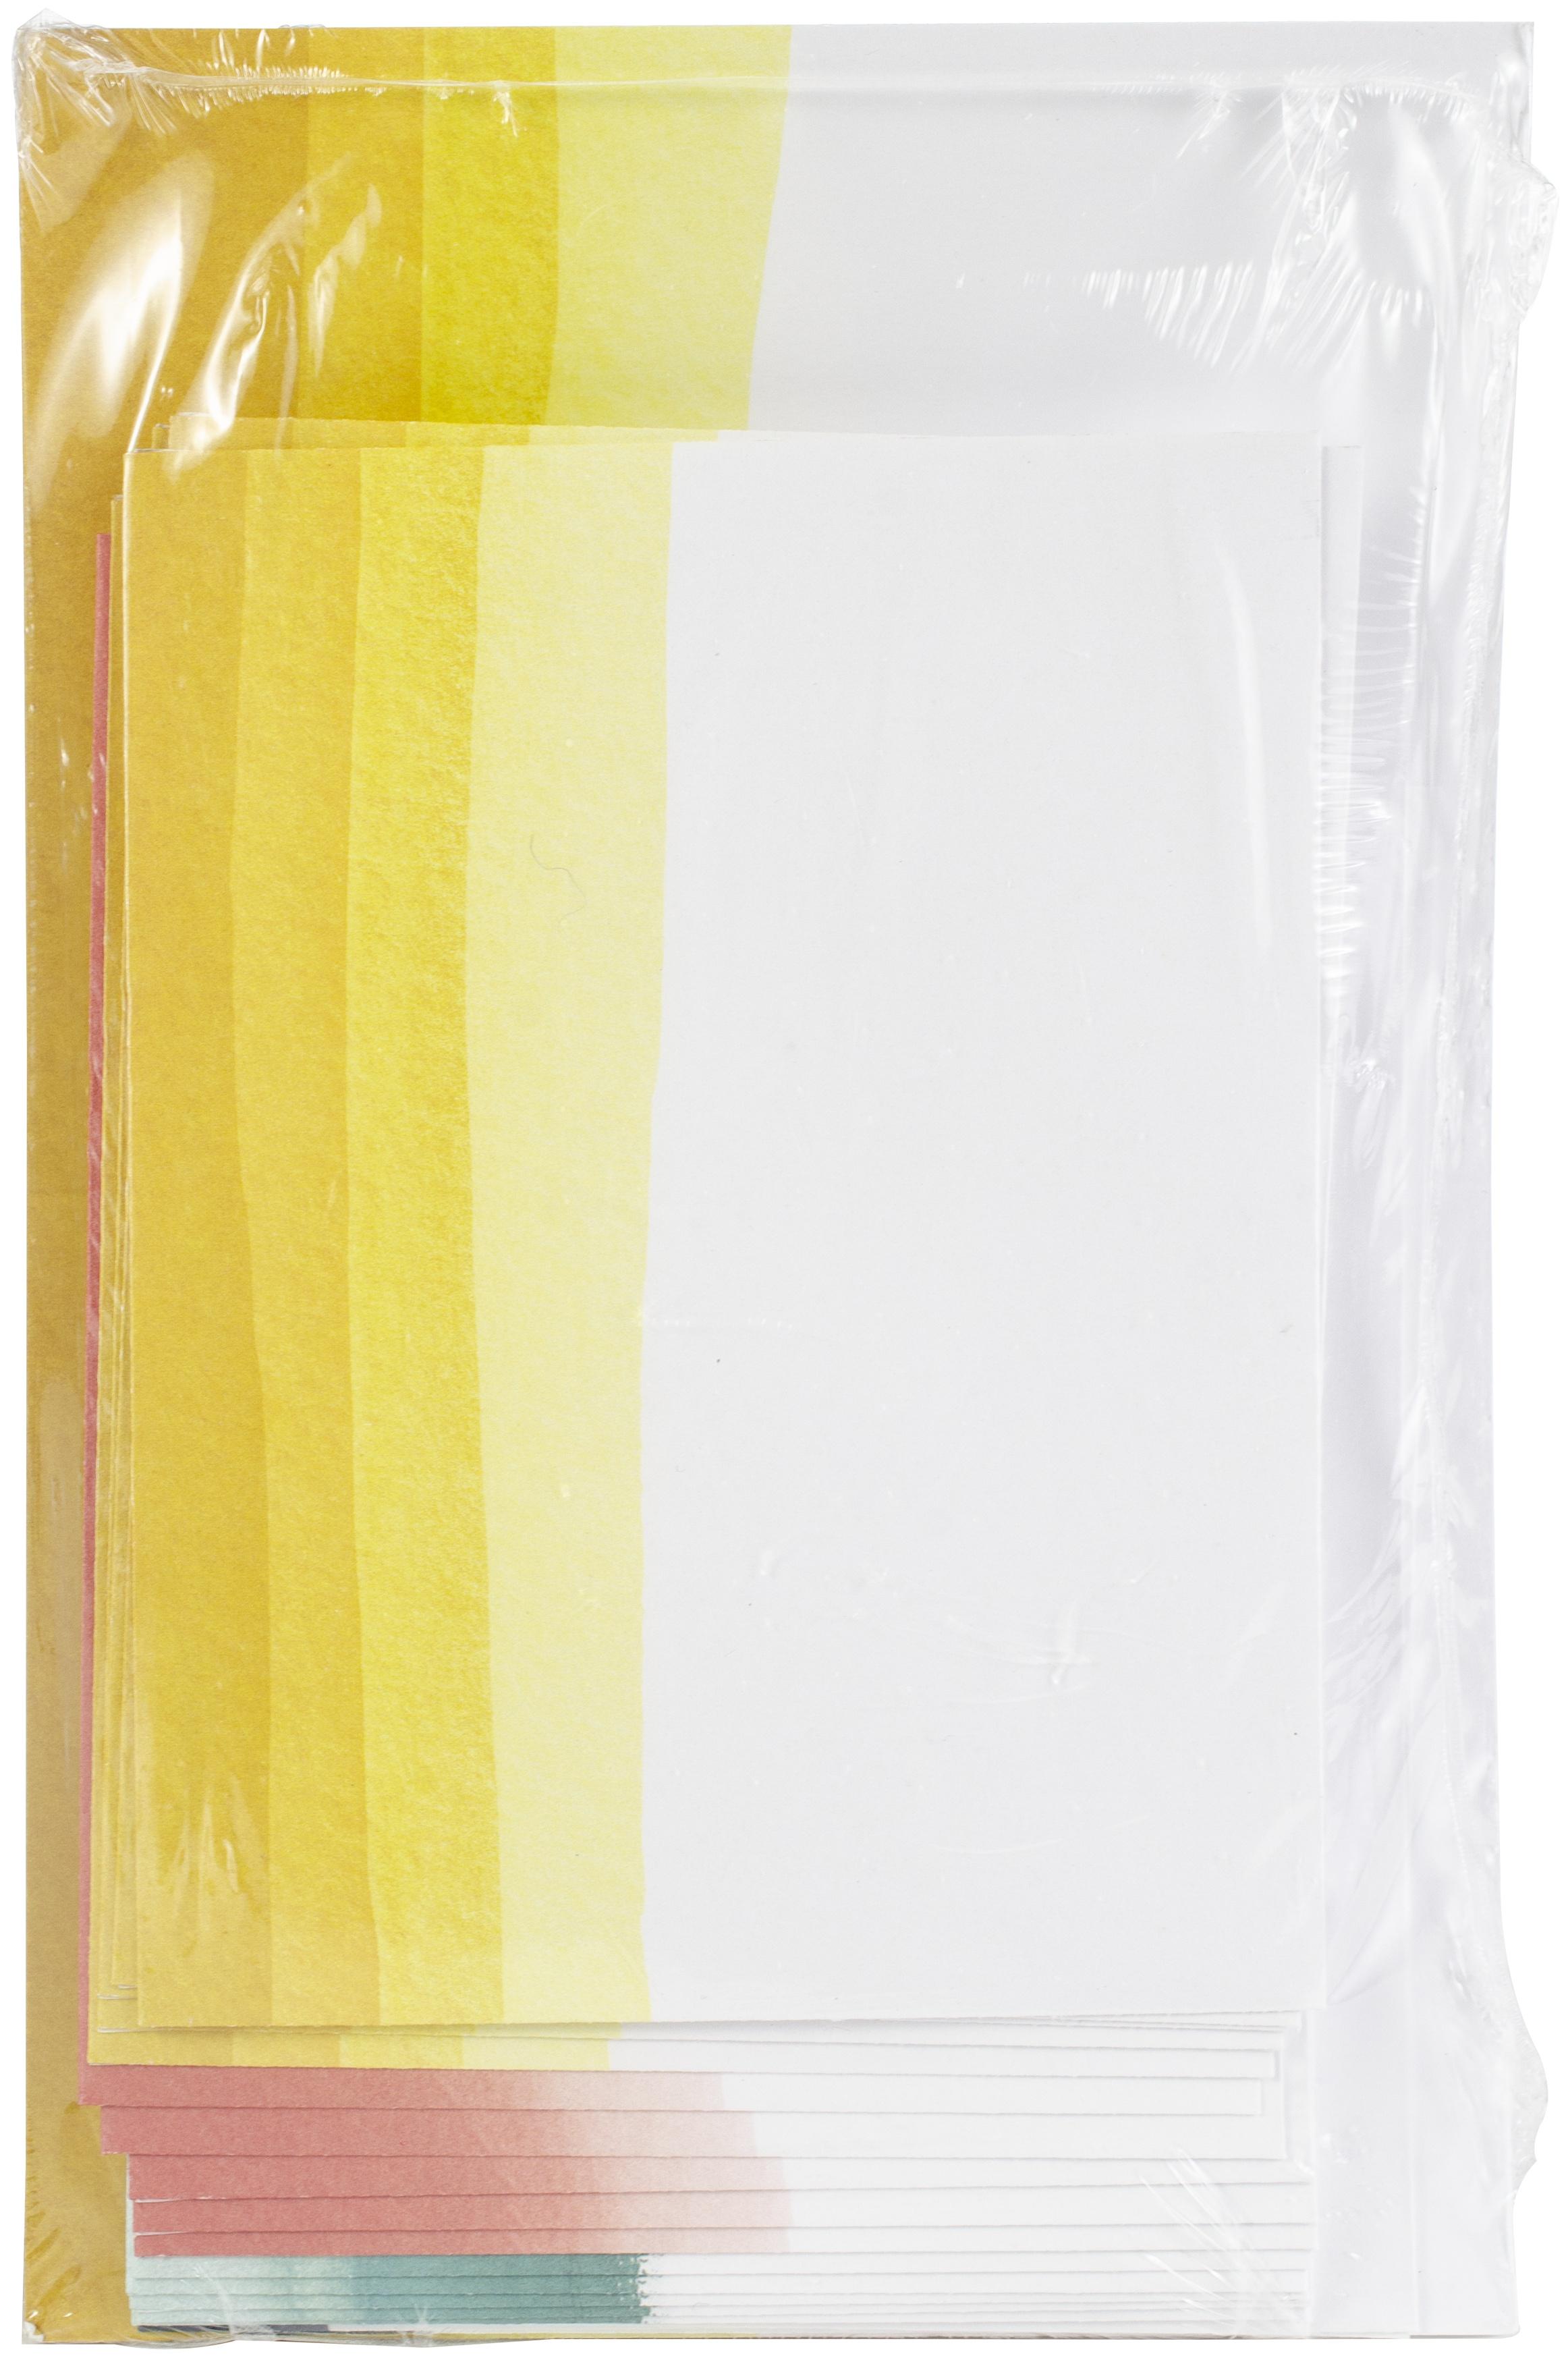 Dip-Dyed Cards/Envelopes